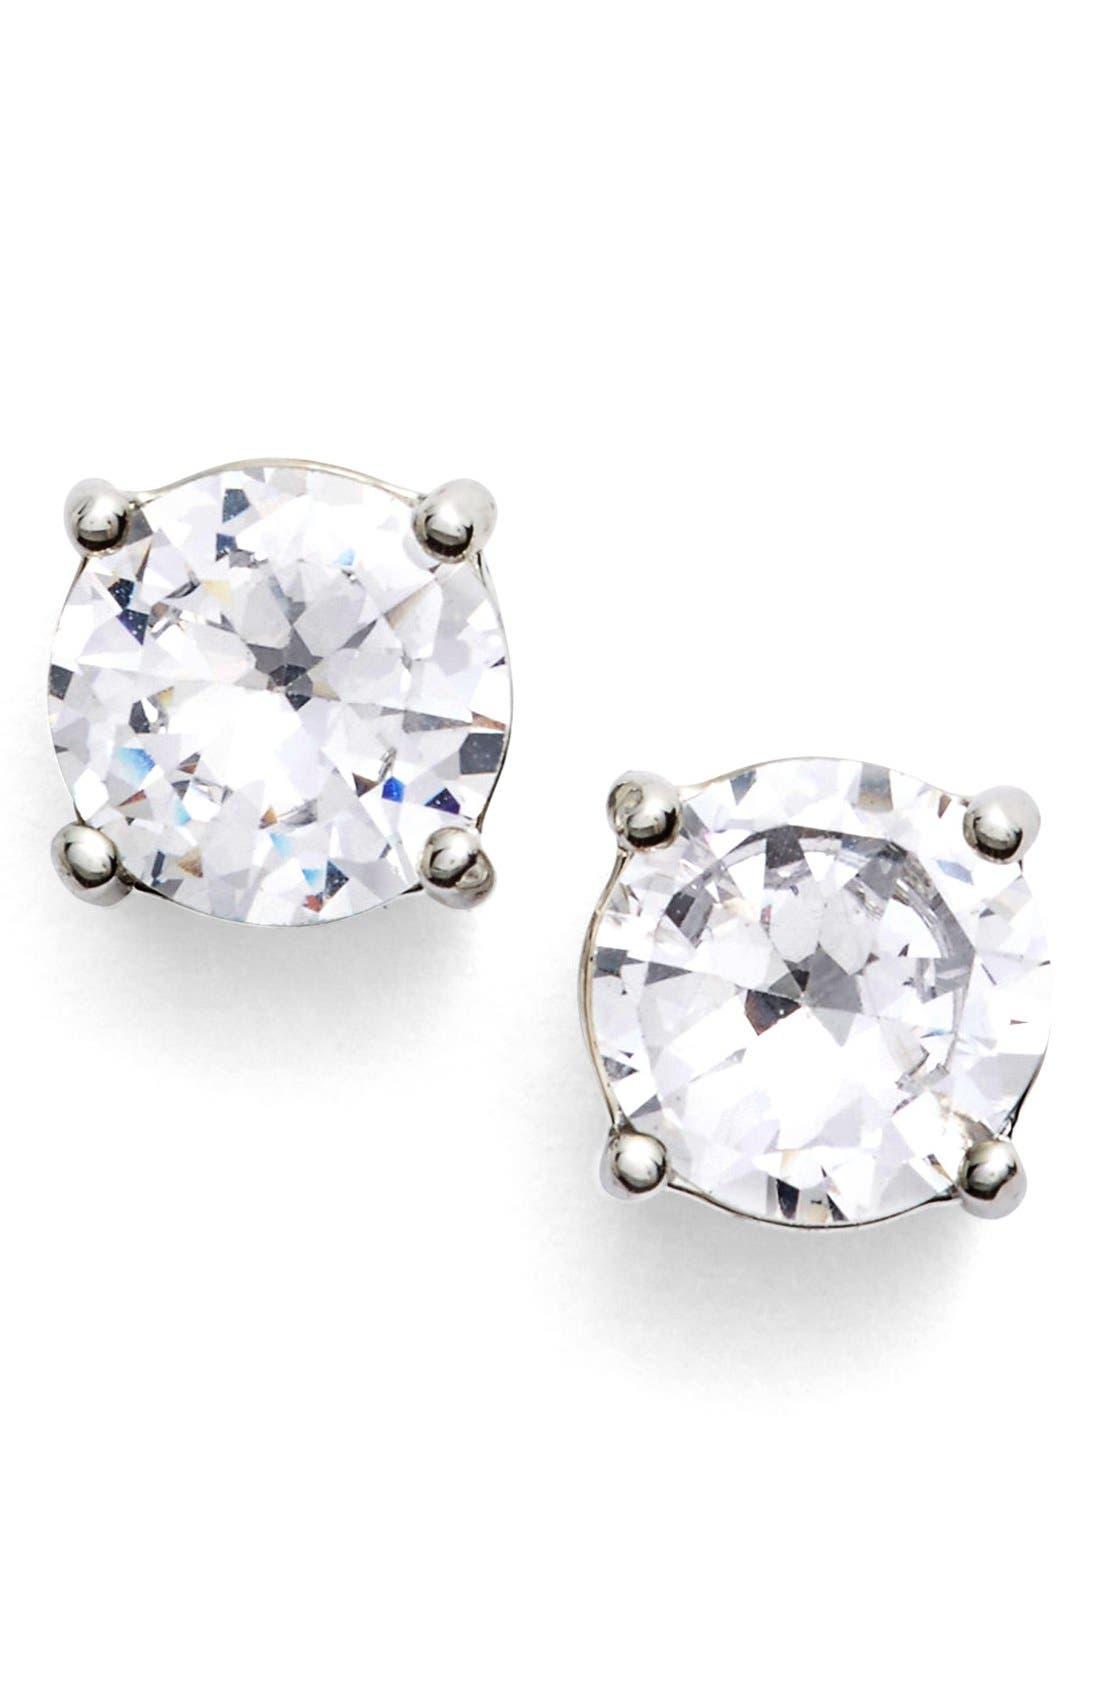 Crystal Stud Earrings,                             Main thumbnail 1, color,                             SILVER